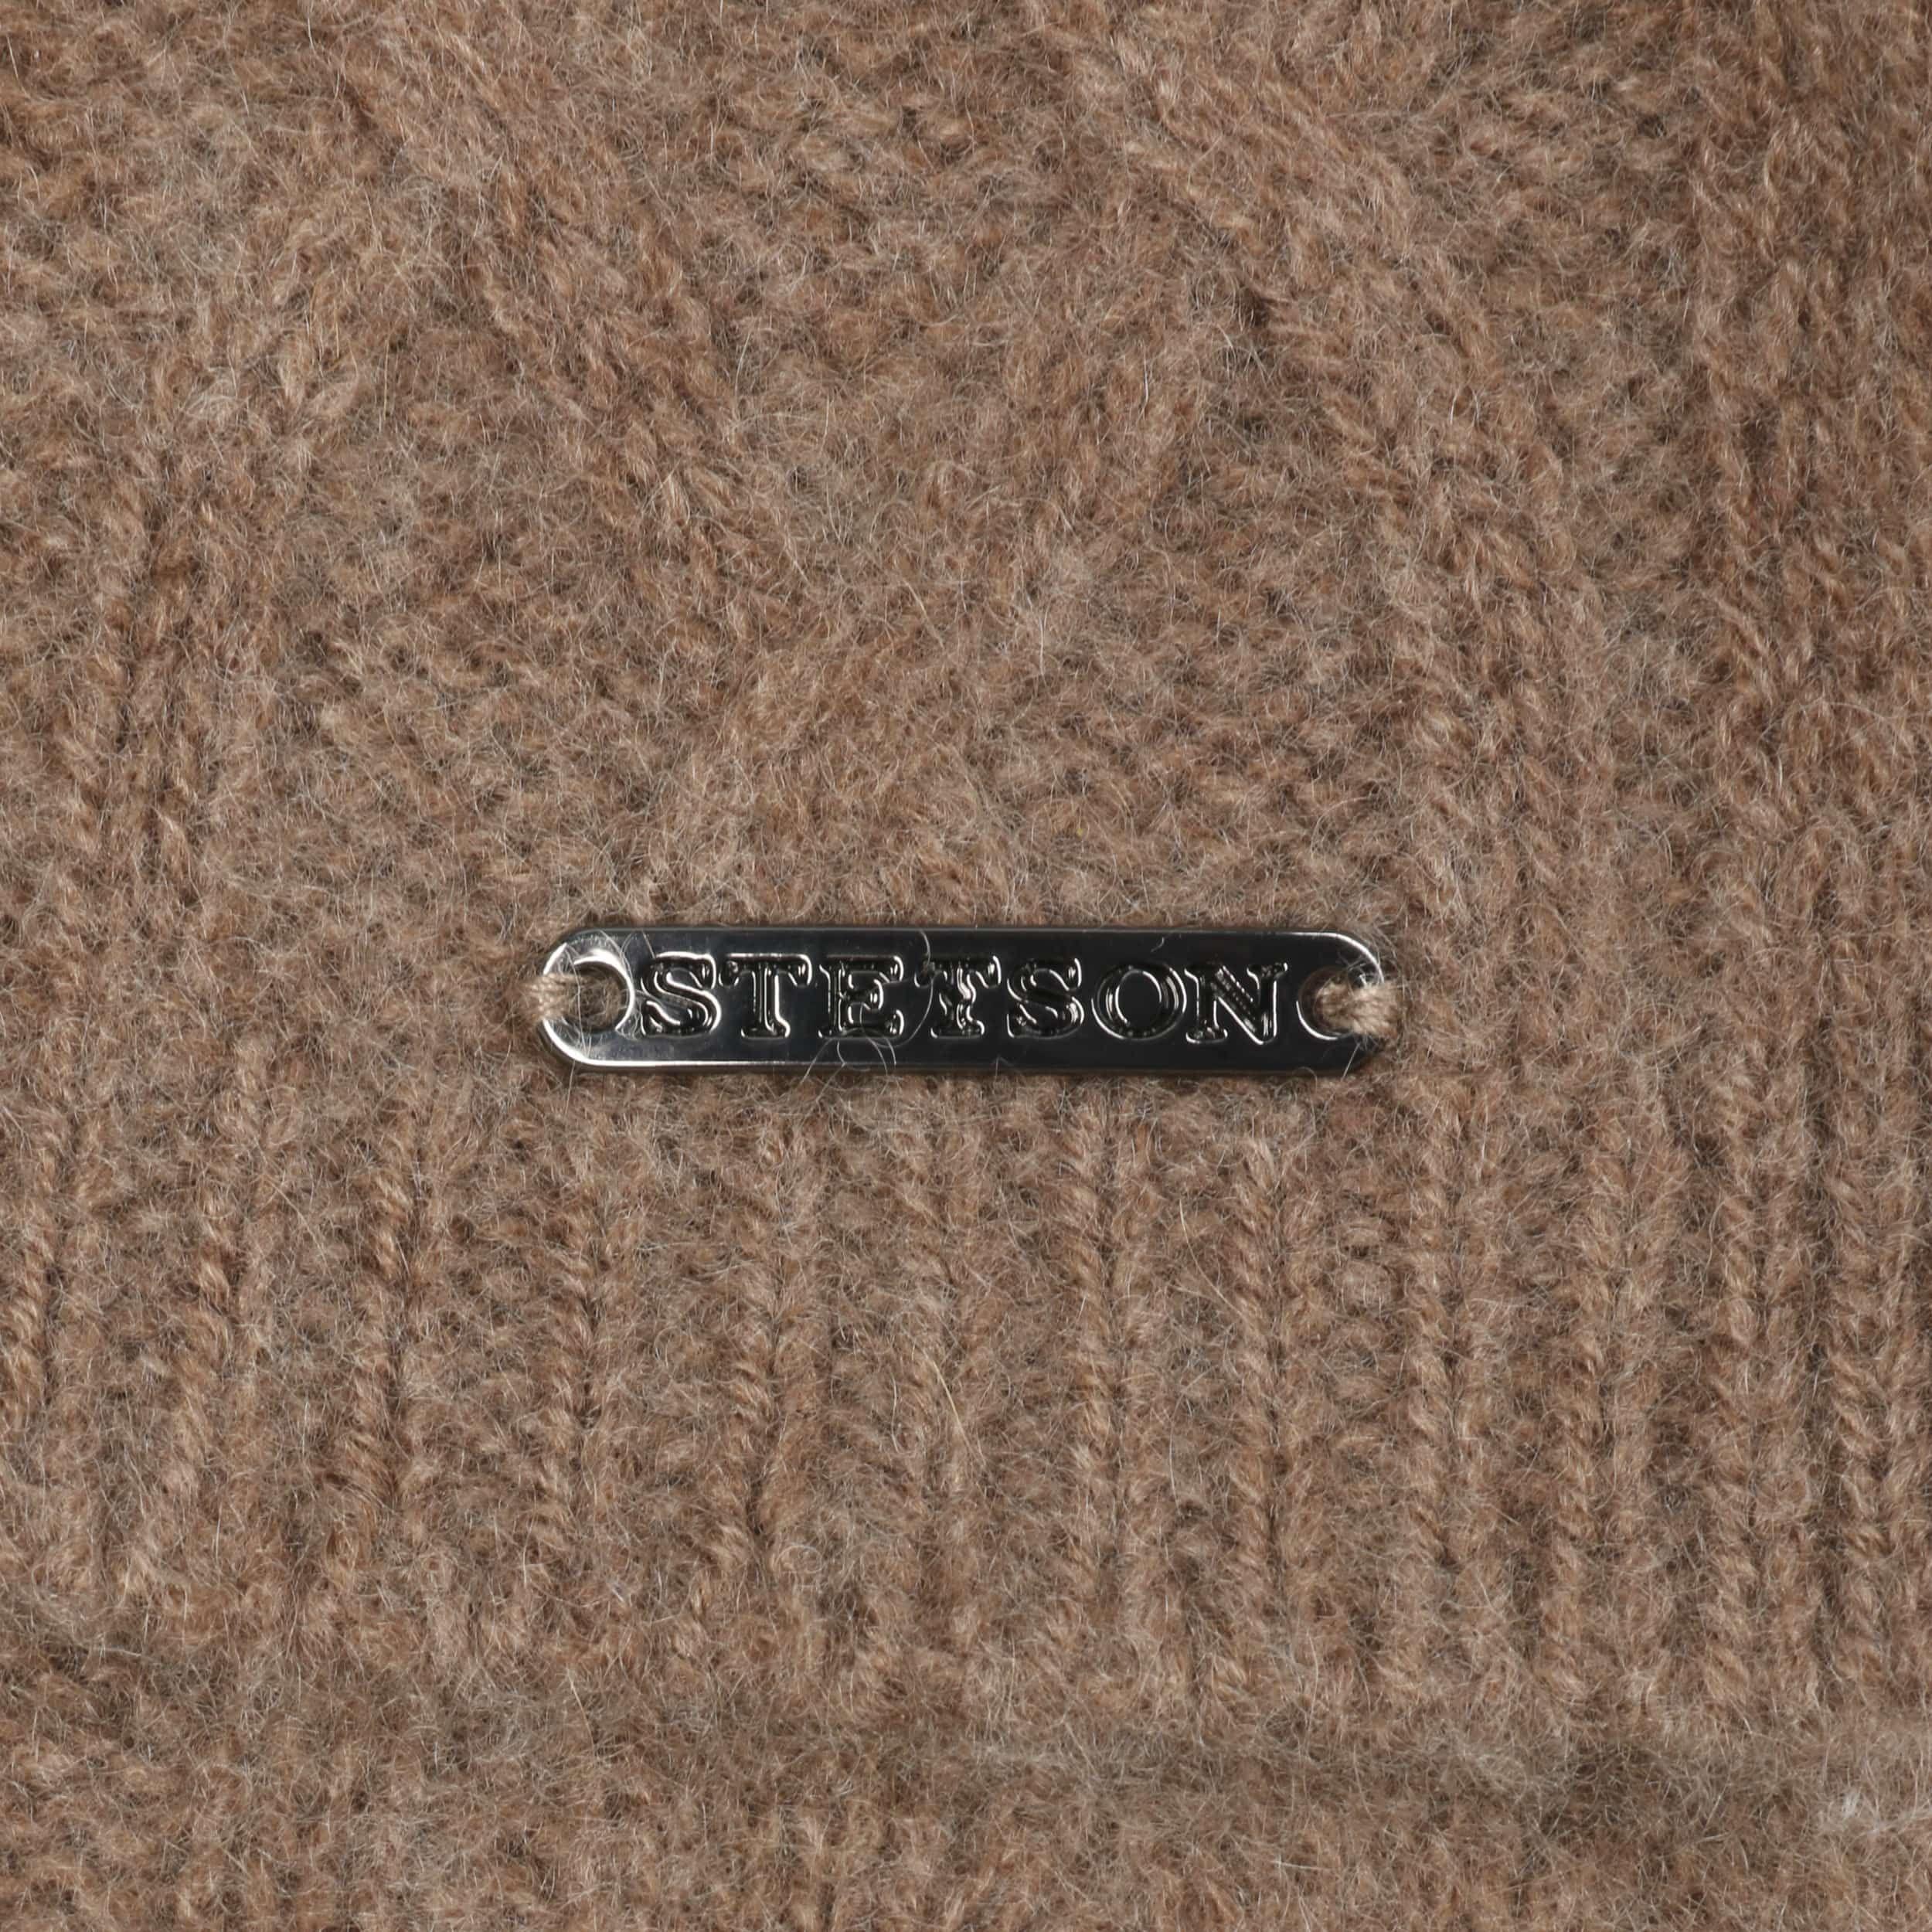 Kentontown Kasjmieren Sjaal beige